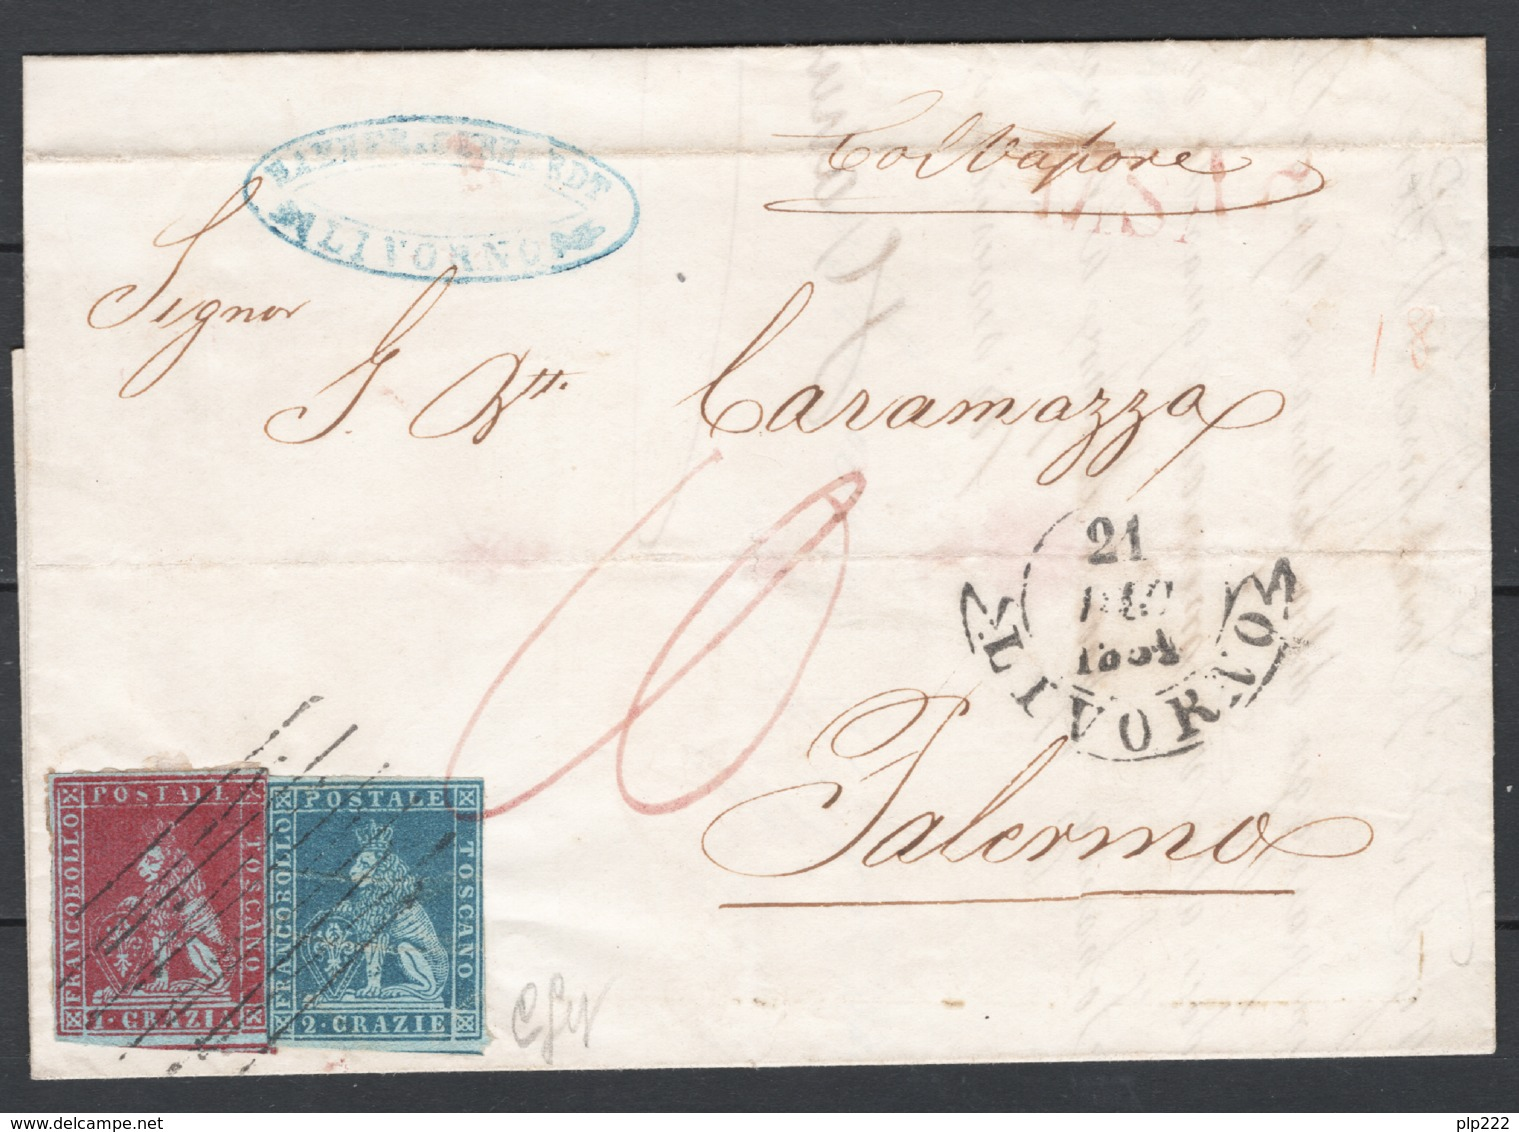 Toscana 1851 1cr.+2cr. Su Lettera Da Livorno A Palermo 21/12/52 Sass.4a+5a O/Used VF/F - Tuscany